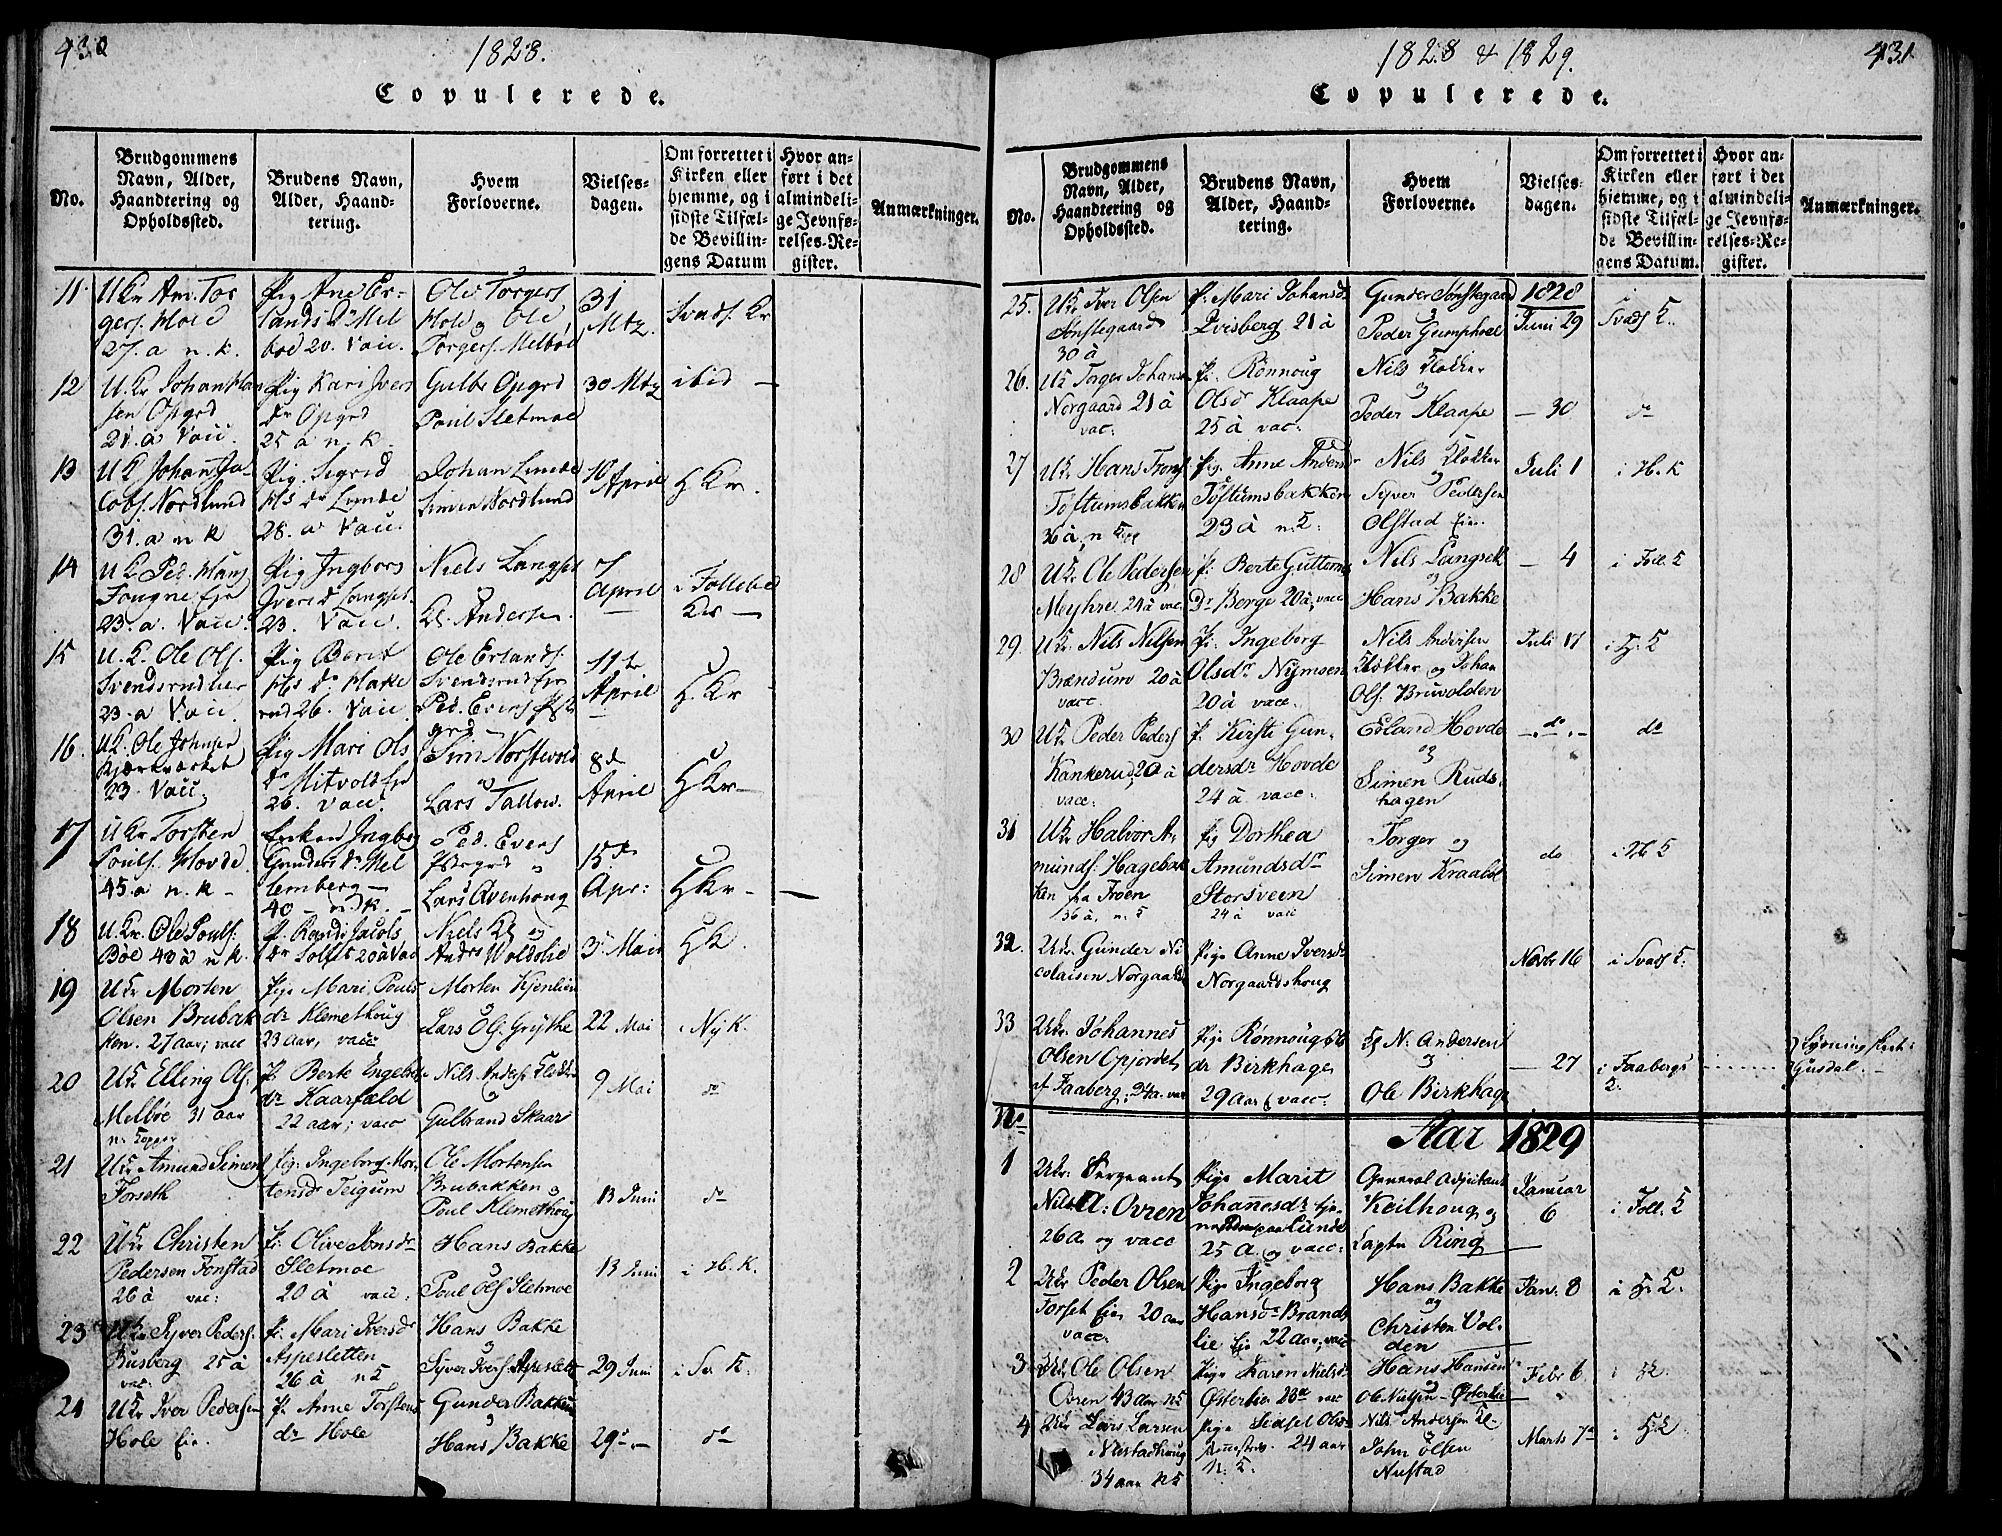 SAH, Gausdal prestekontor, Ministerialbok nr. 5, 1817-1829, s. 430-431